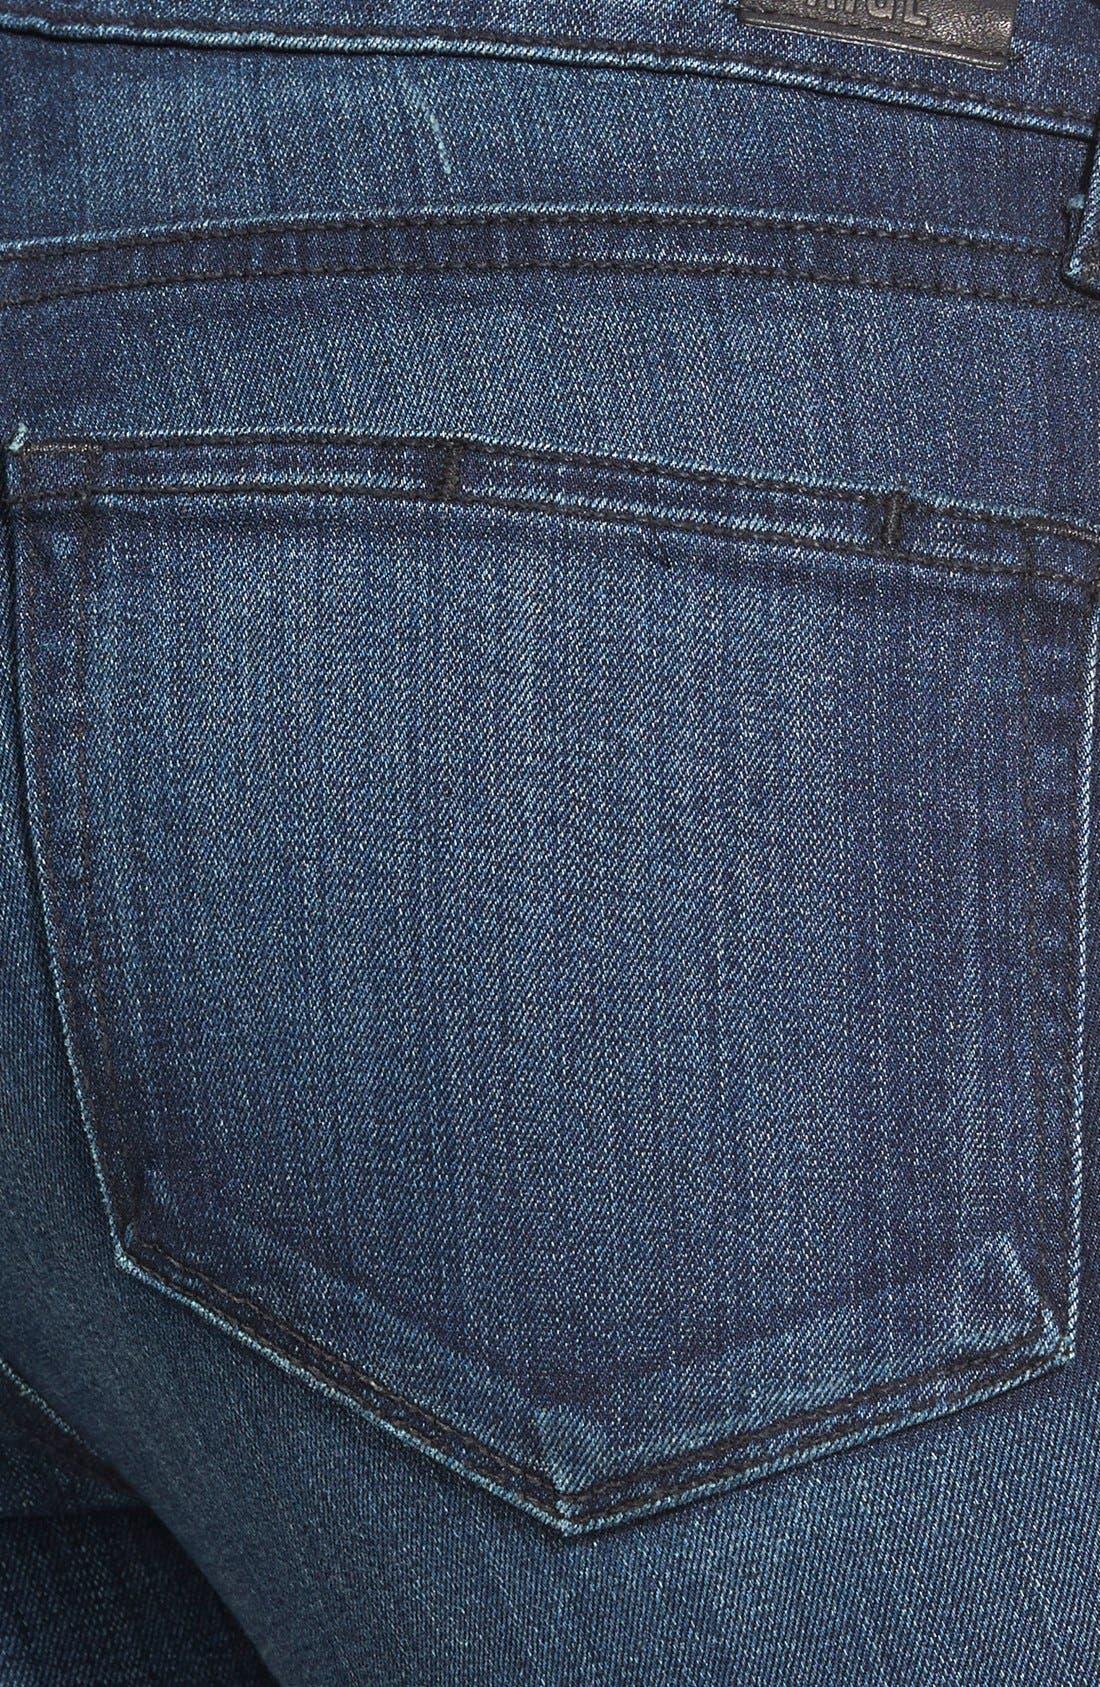 Alternate Image 3  - Paige Denim 'Transcend - Verdugo' Ultra Skinny Jeans (Valor)